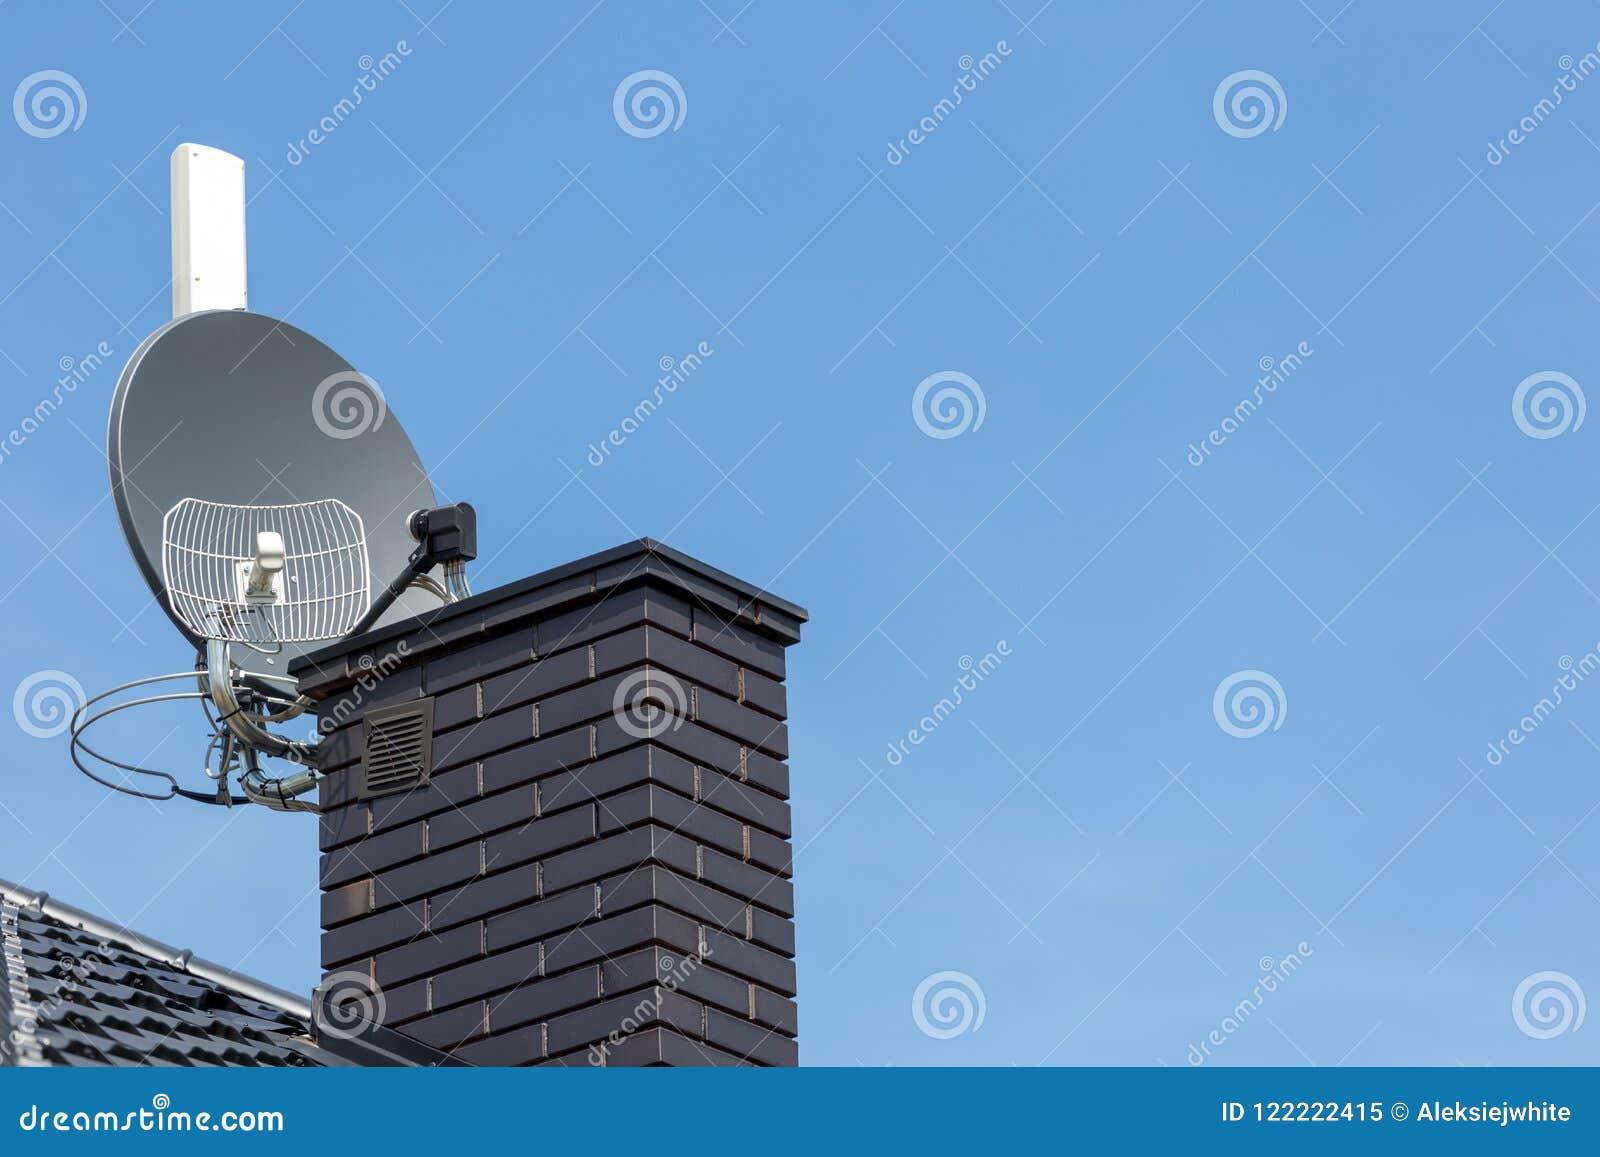 Satellite Dish And Tv, Radio And Wireless Internet Antenna Stock